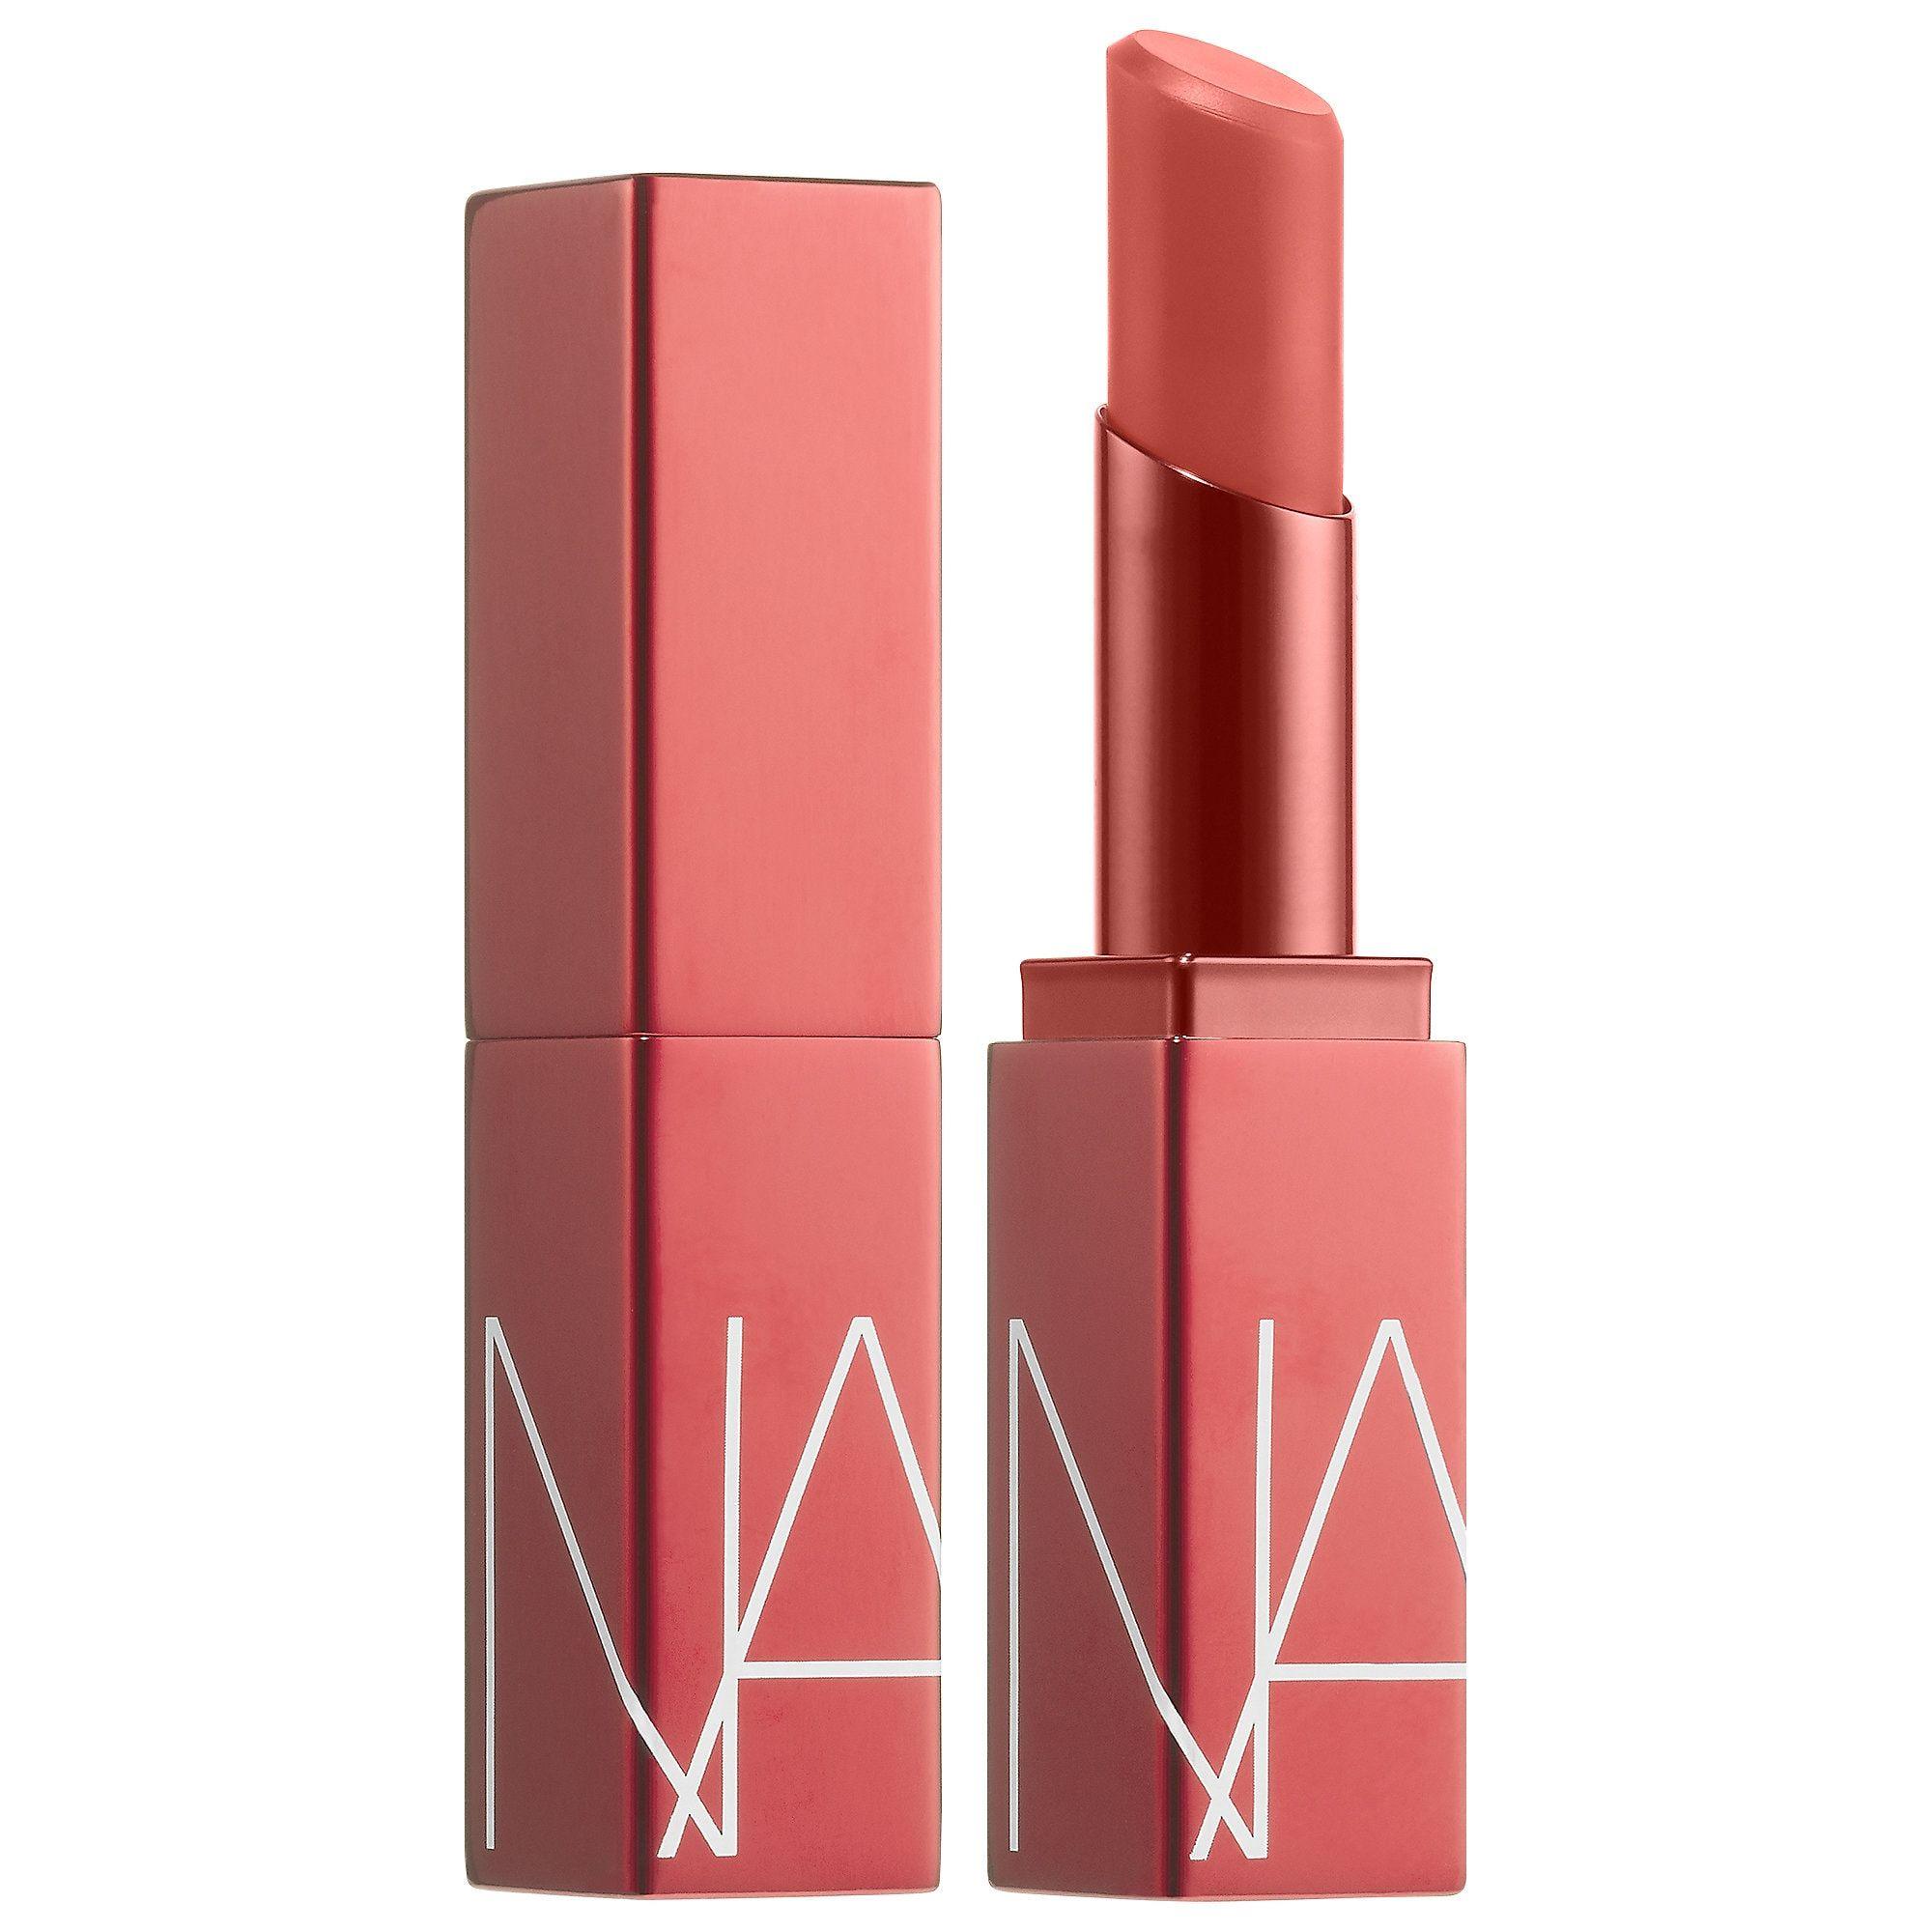 Afterglow Lip Balm Torrid 0.1 oz/ 3 G trong 2020 | Mascaras